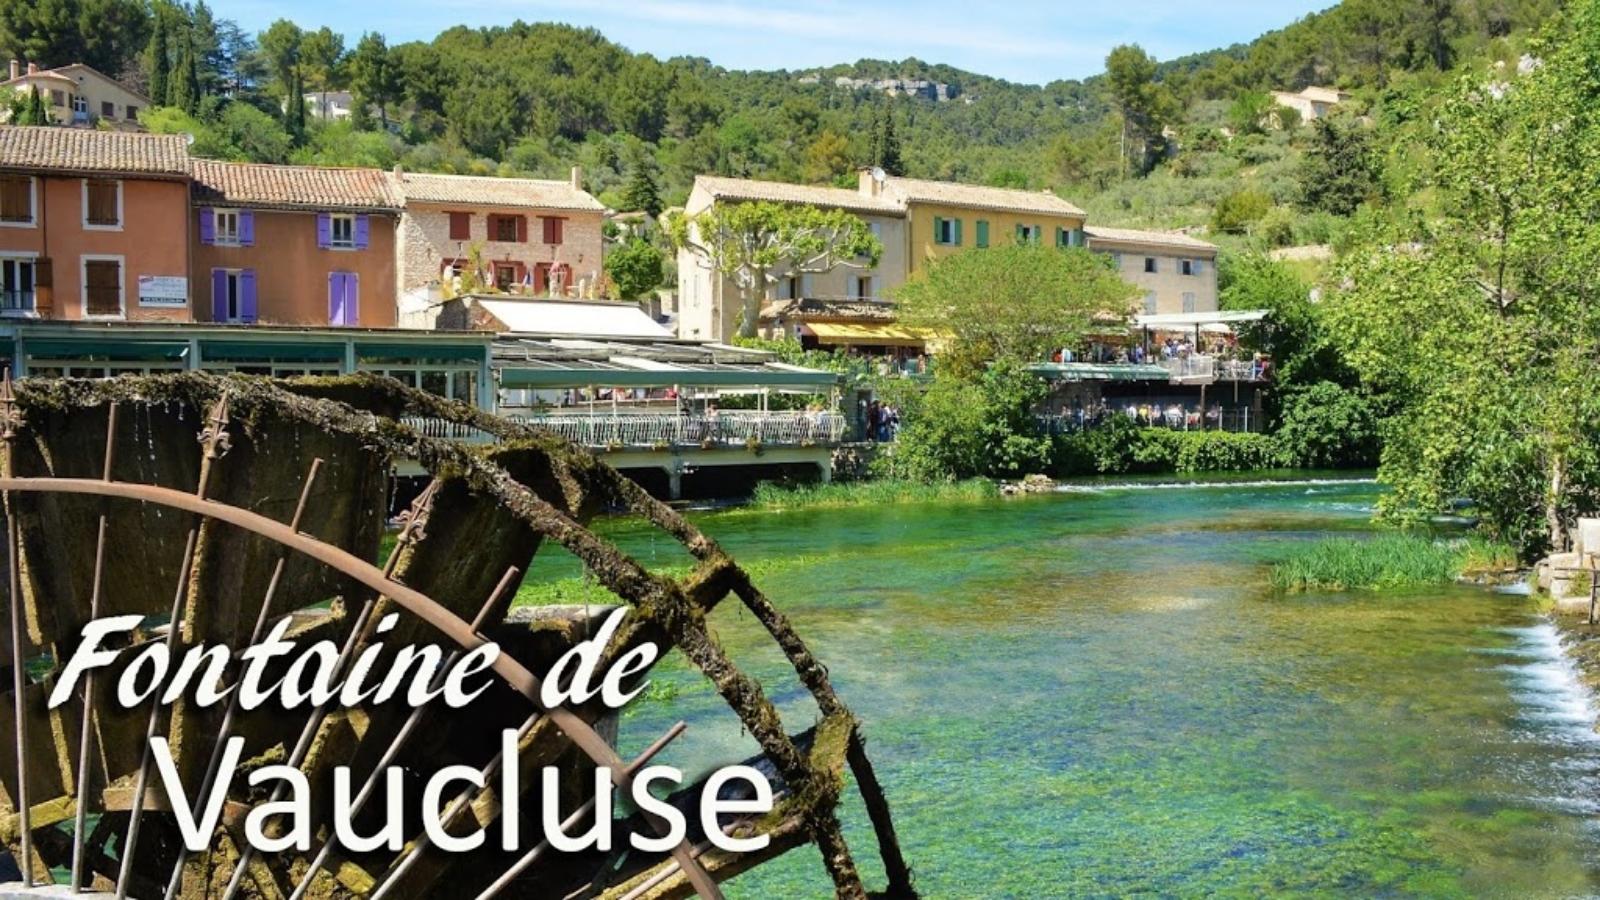 Fontaine de Vaucluse, e la misteriosa sorgente!